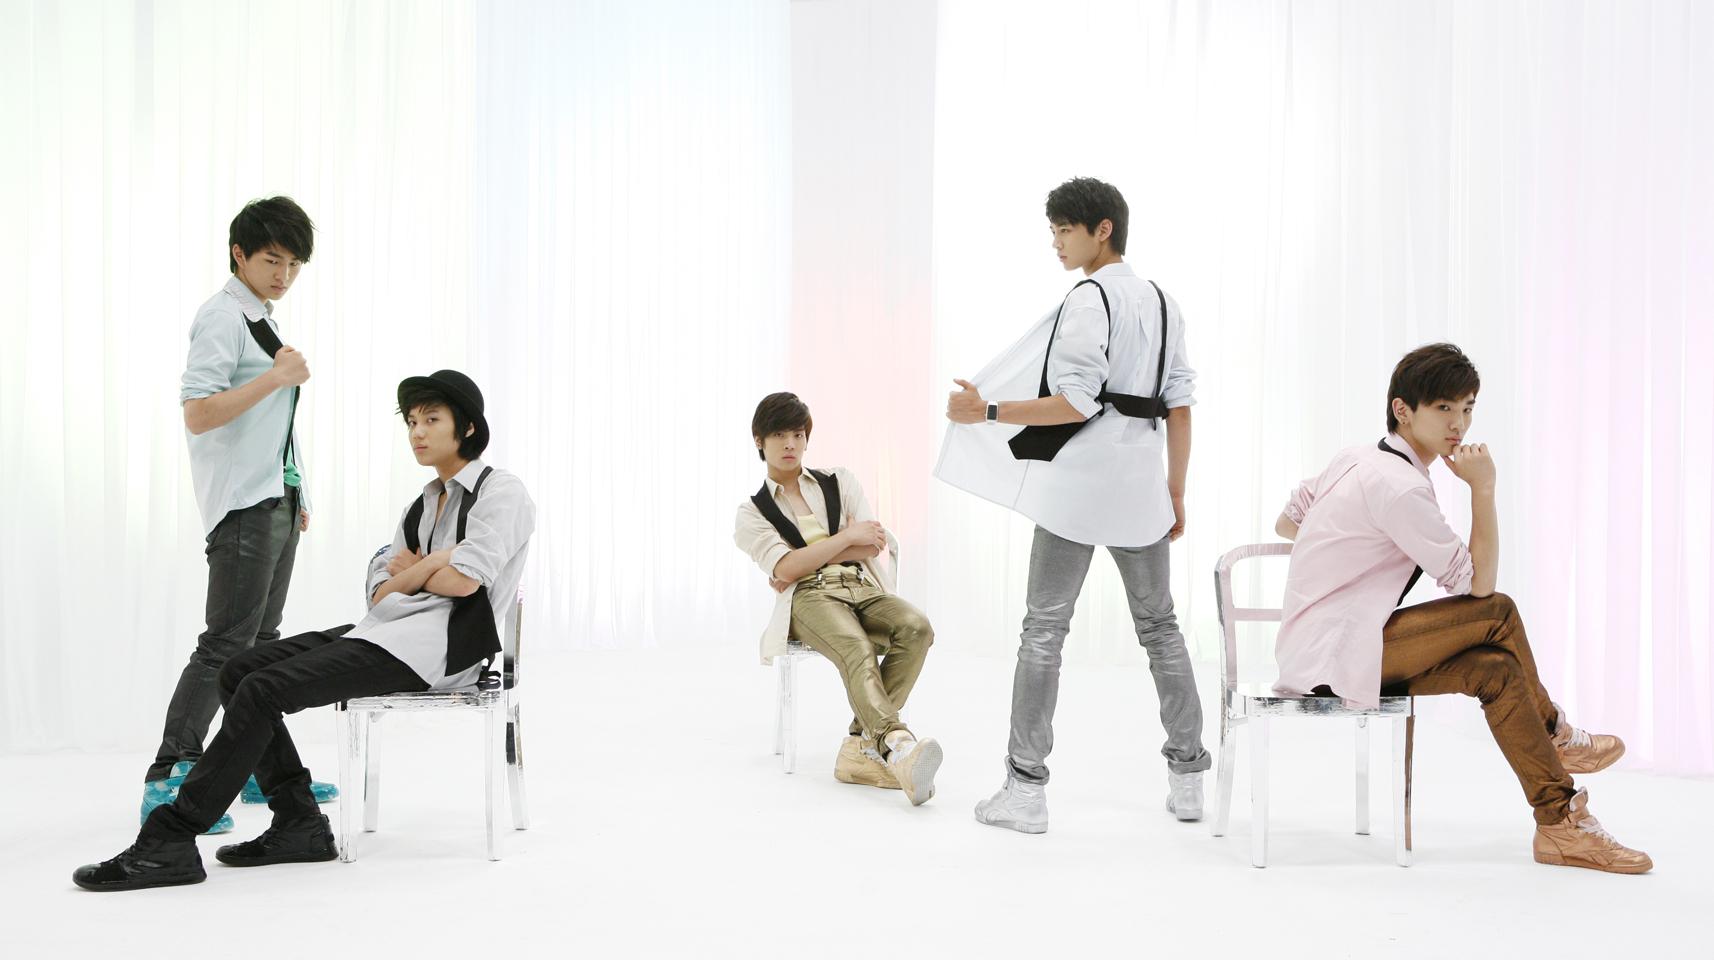 Shinee Images Shinee-love Like Oxygen Hd Wallpaper - Shinee Love Like Oxygen , HD Wallpaper & Backgrounds